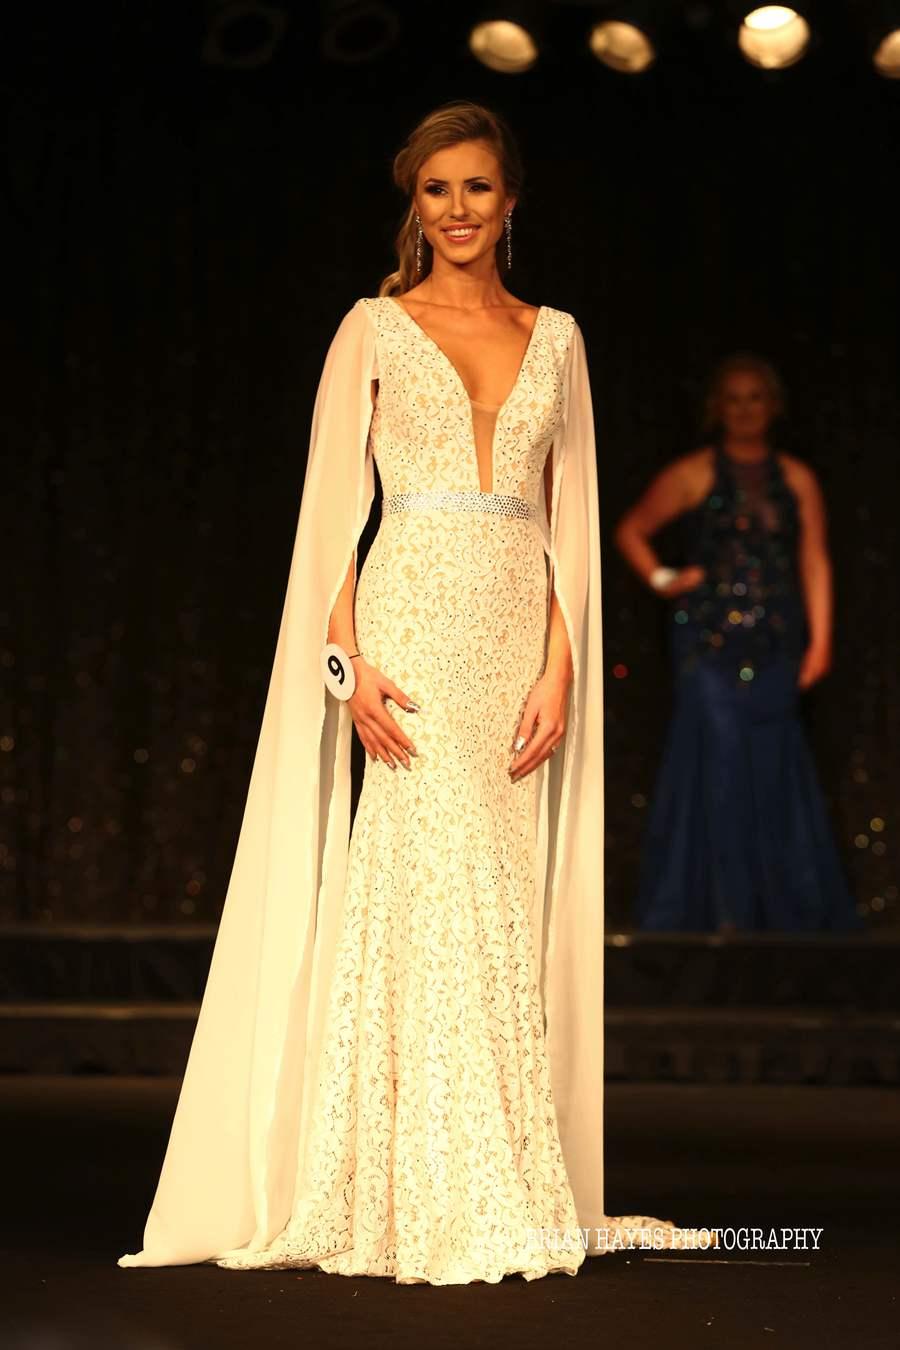 Jovani queen / Model Ms Hunter / Uploaded 30th January 2020 @ 01:46 PM